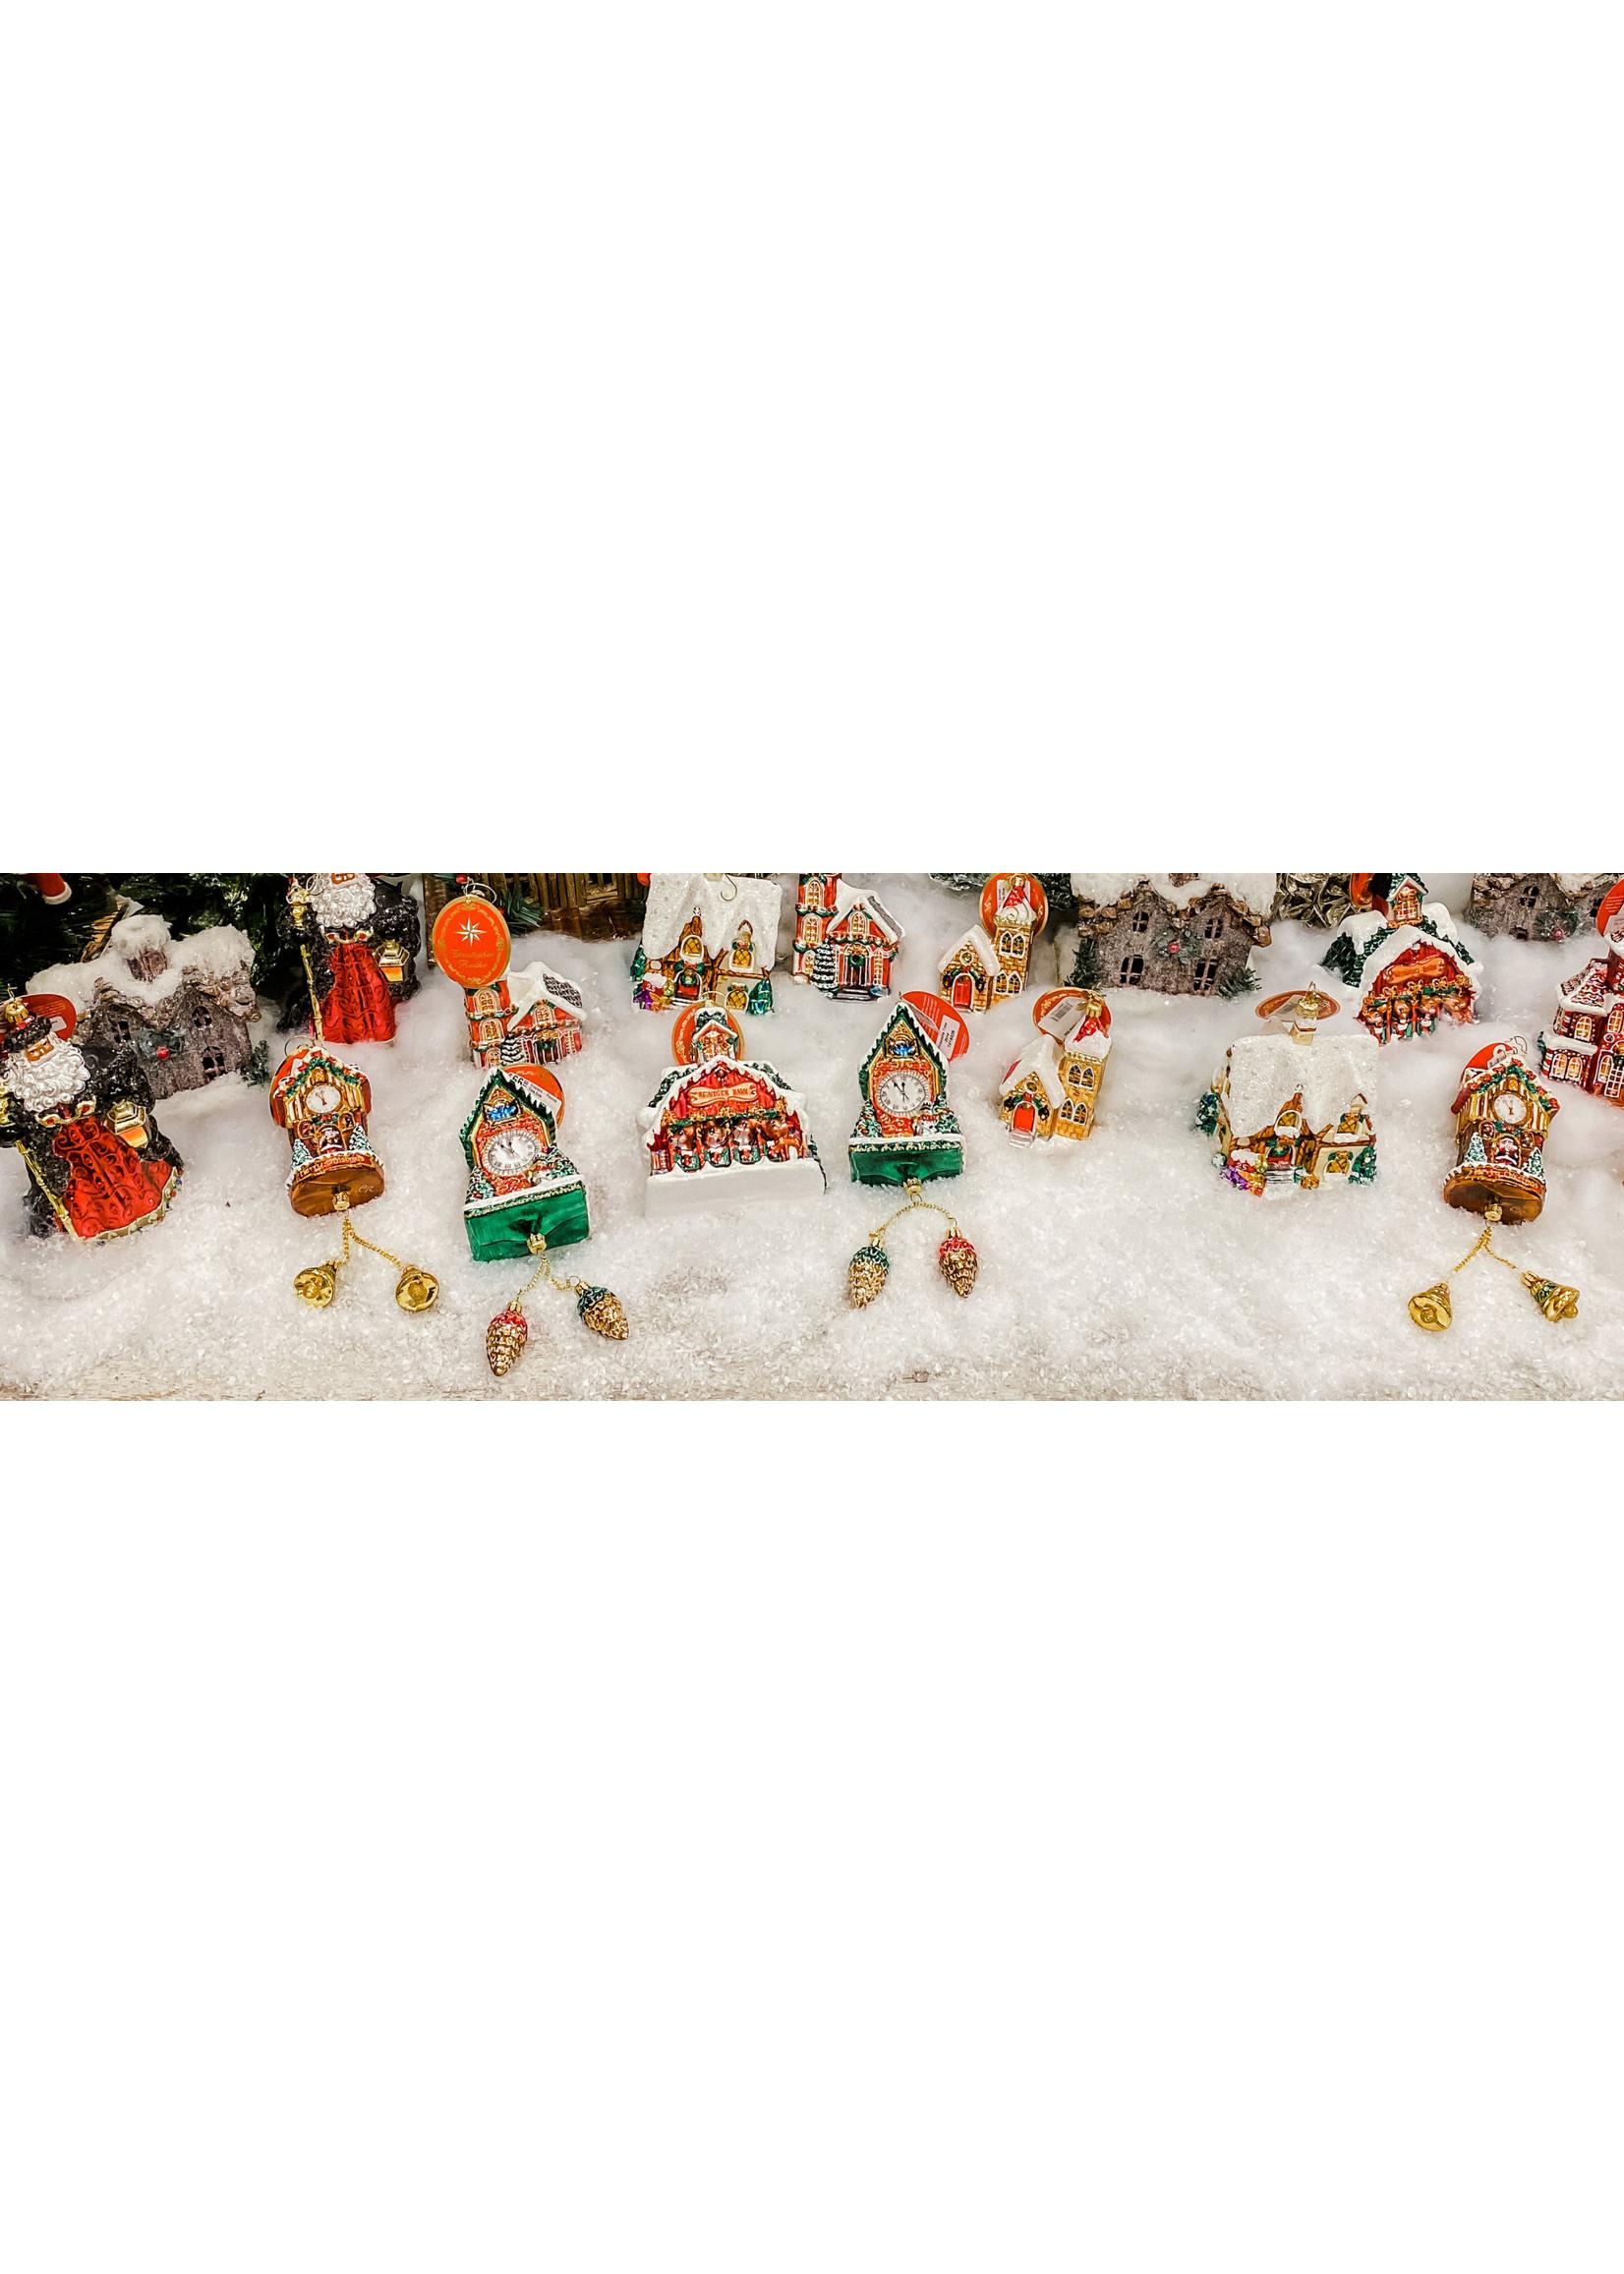 Christopher Radko Ornament - Ebony Clad Mr. Claus